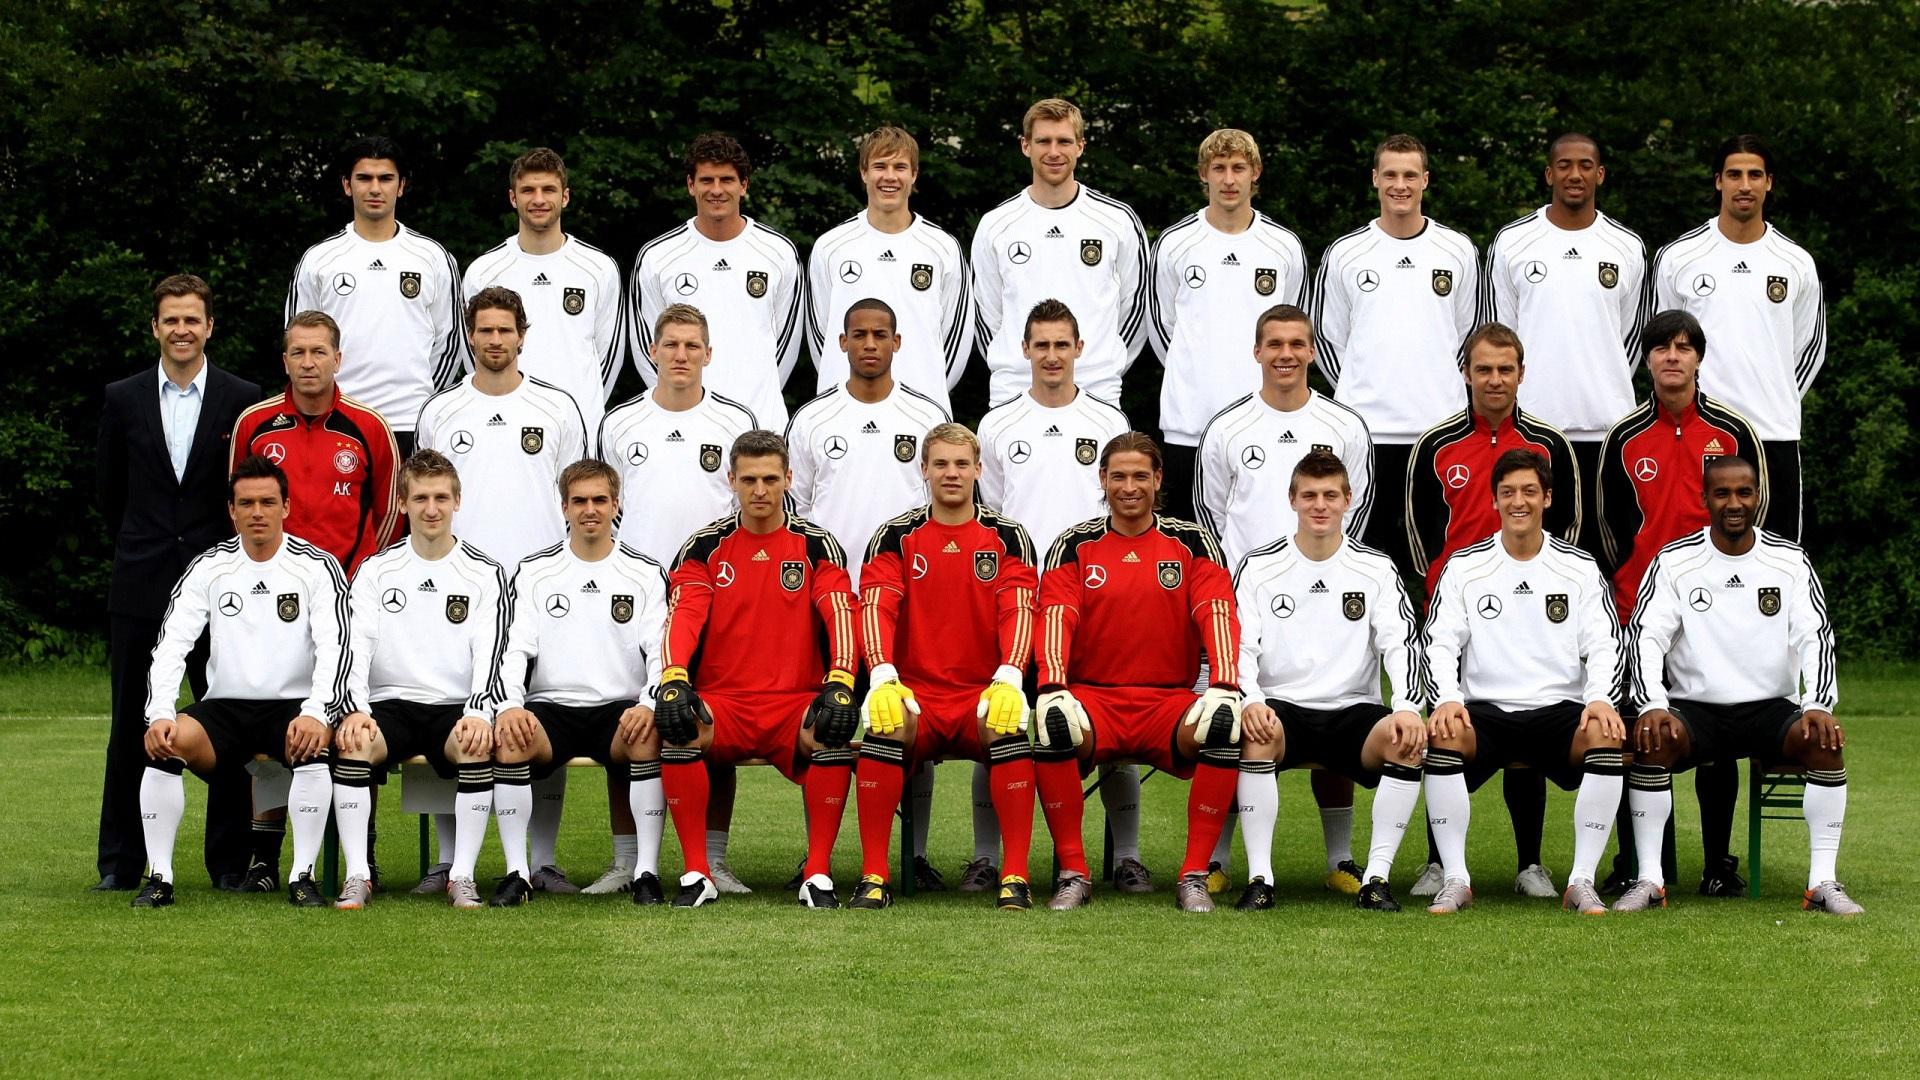 England Football Team Wallpapers Download Desktop Wallpaper 1920x1080